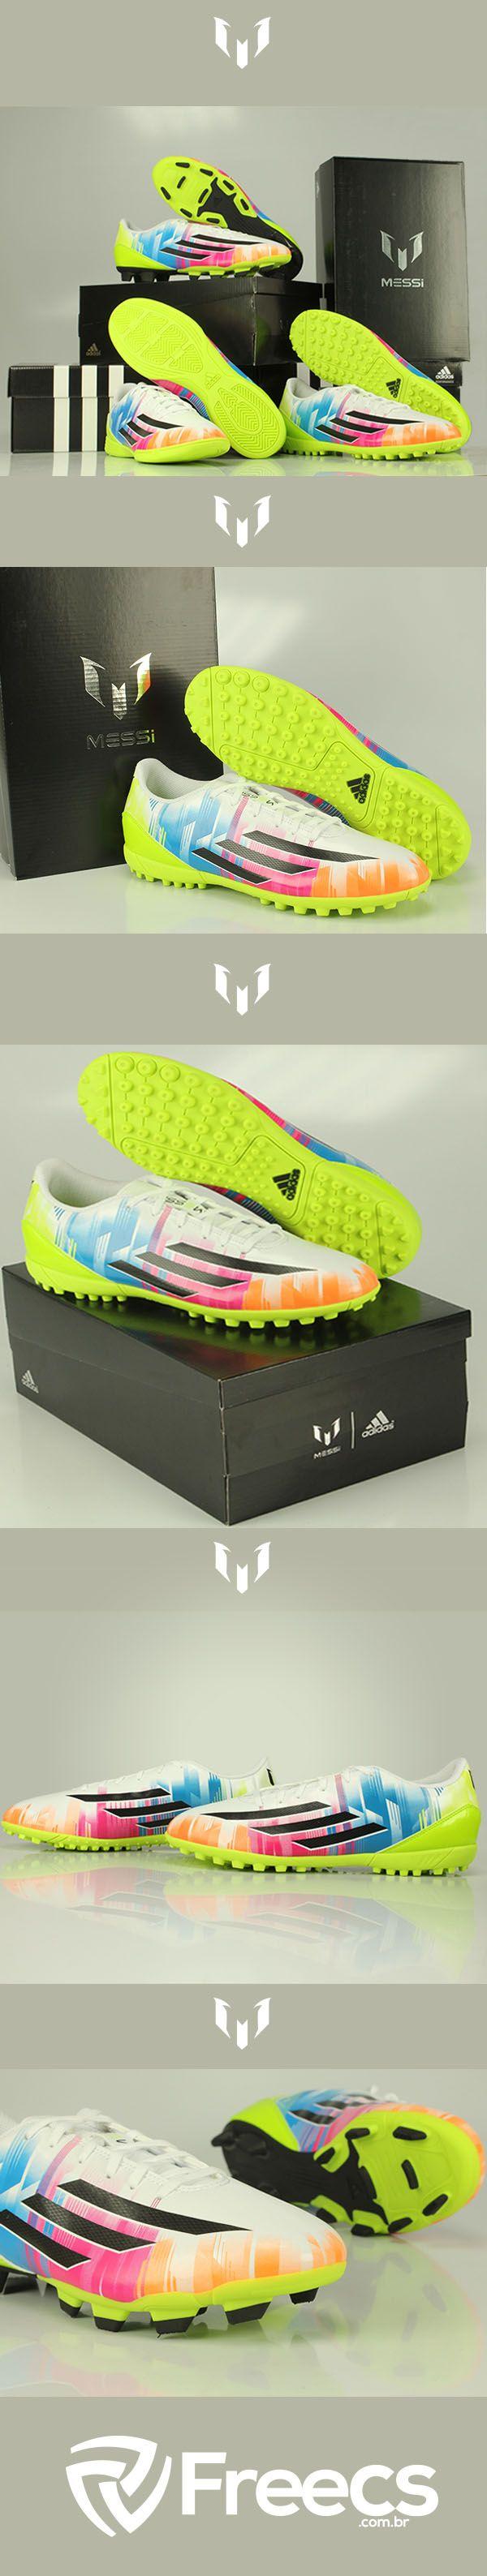 #adidas #lançamento #messi #estilo #freeCS